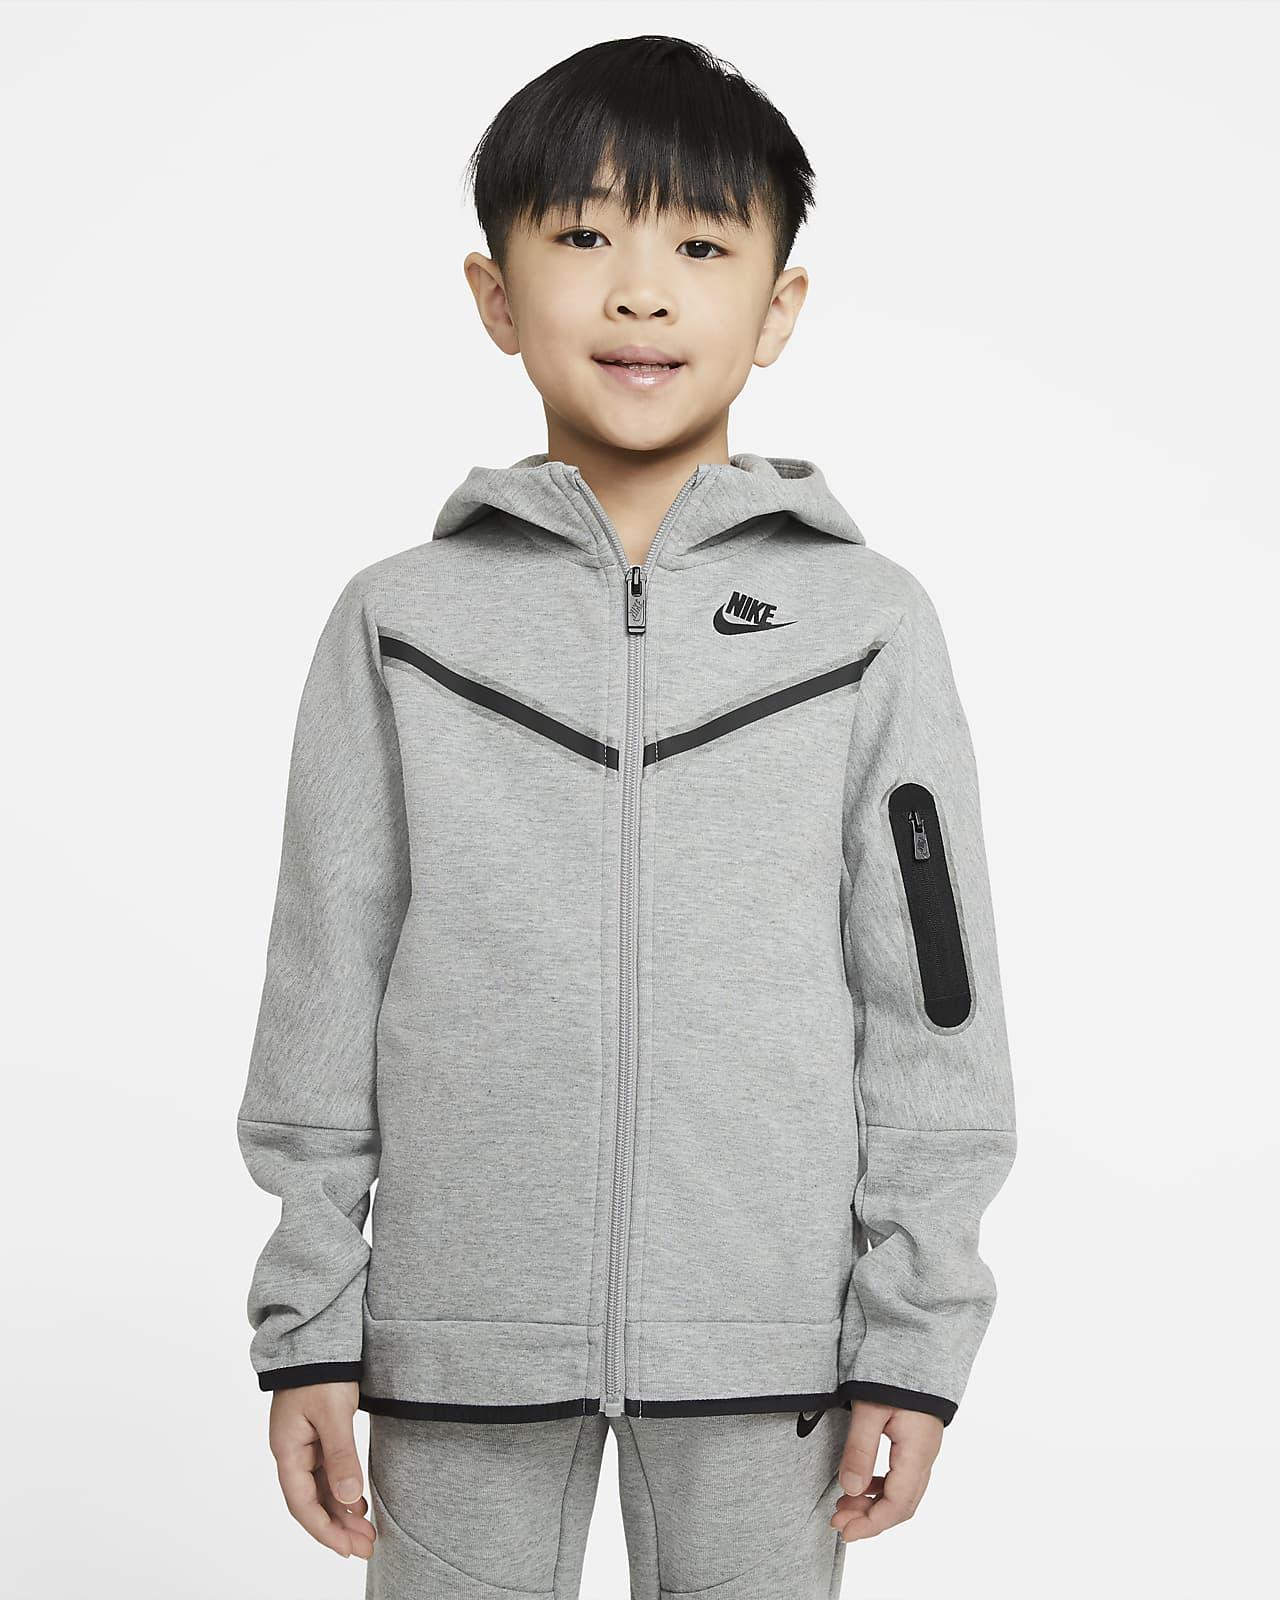 Nike Sportswear Tech Fleece Sudadera con capucha y cremallera completa - Niño/a pequeño/a